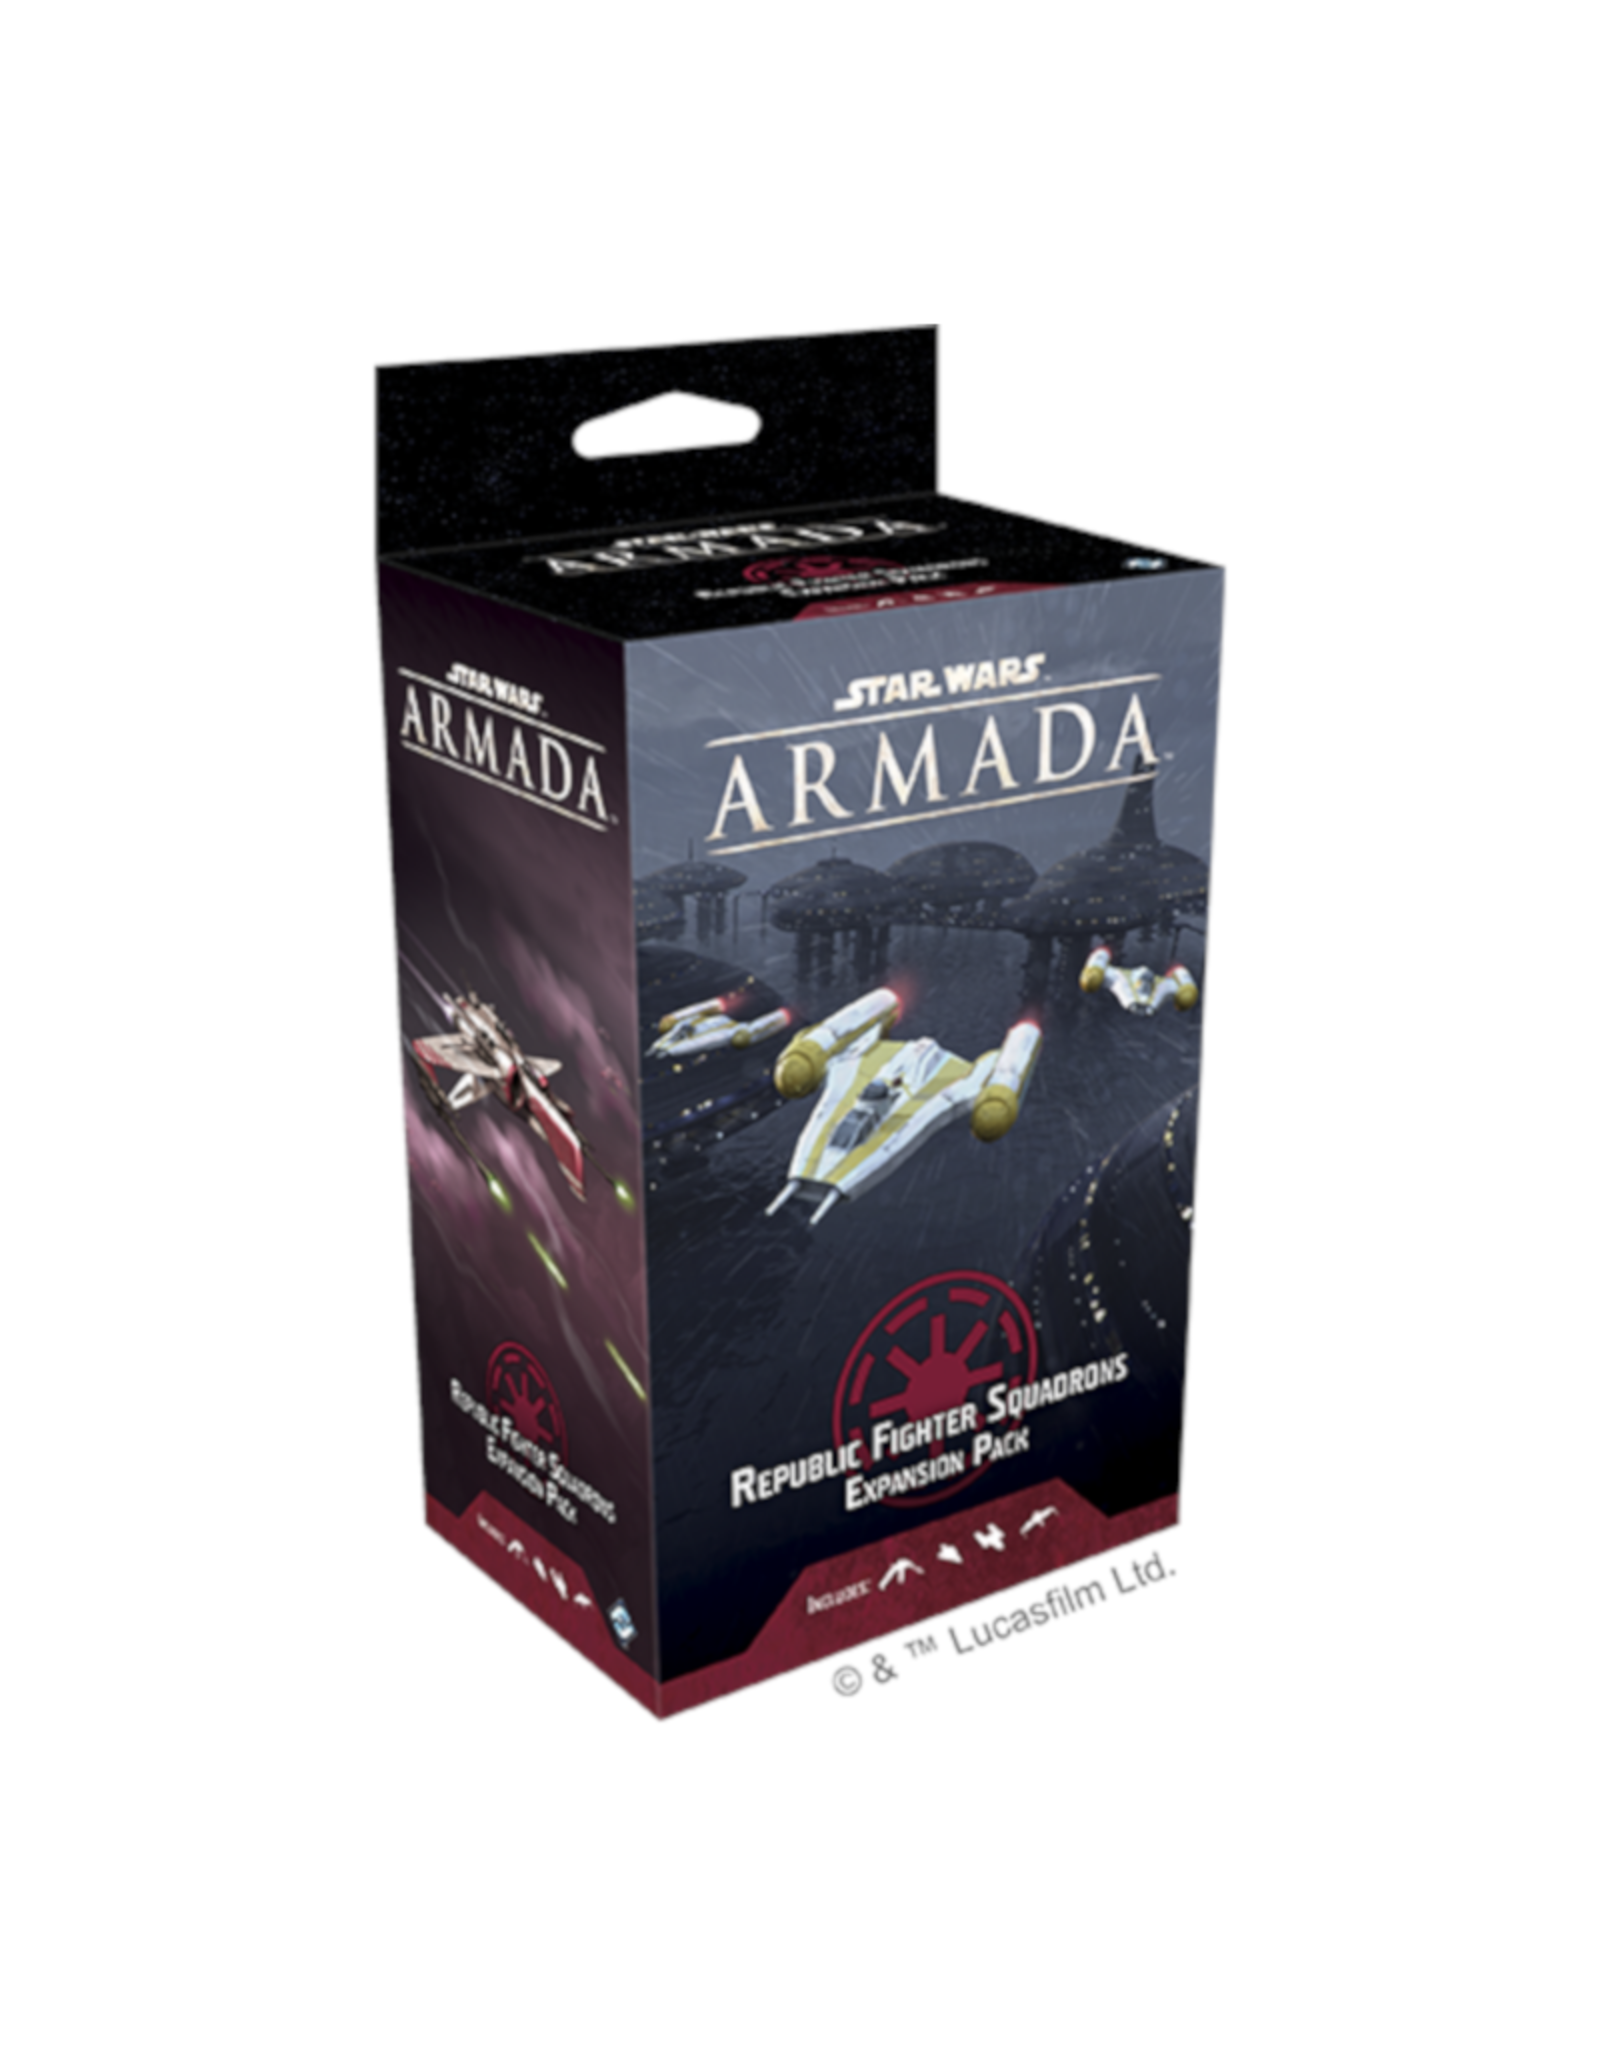 Fantasy Flight Games Star Wars Armada Republic Fighter Squad Expansion